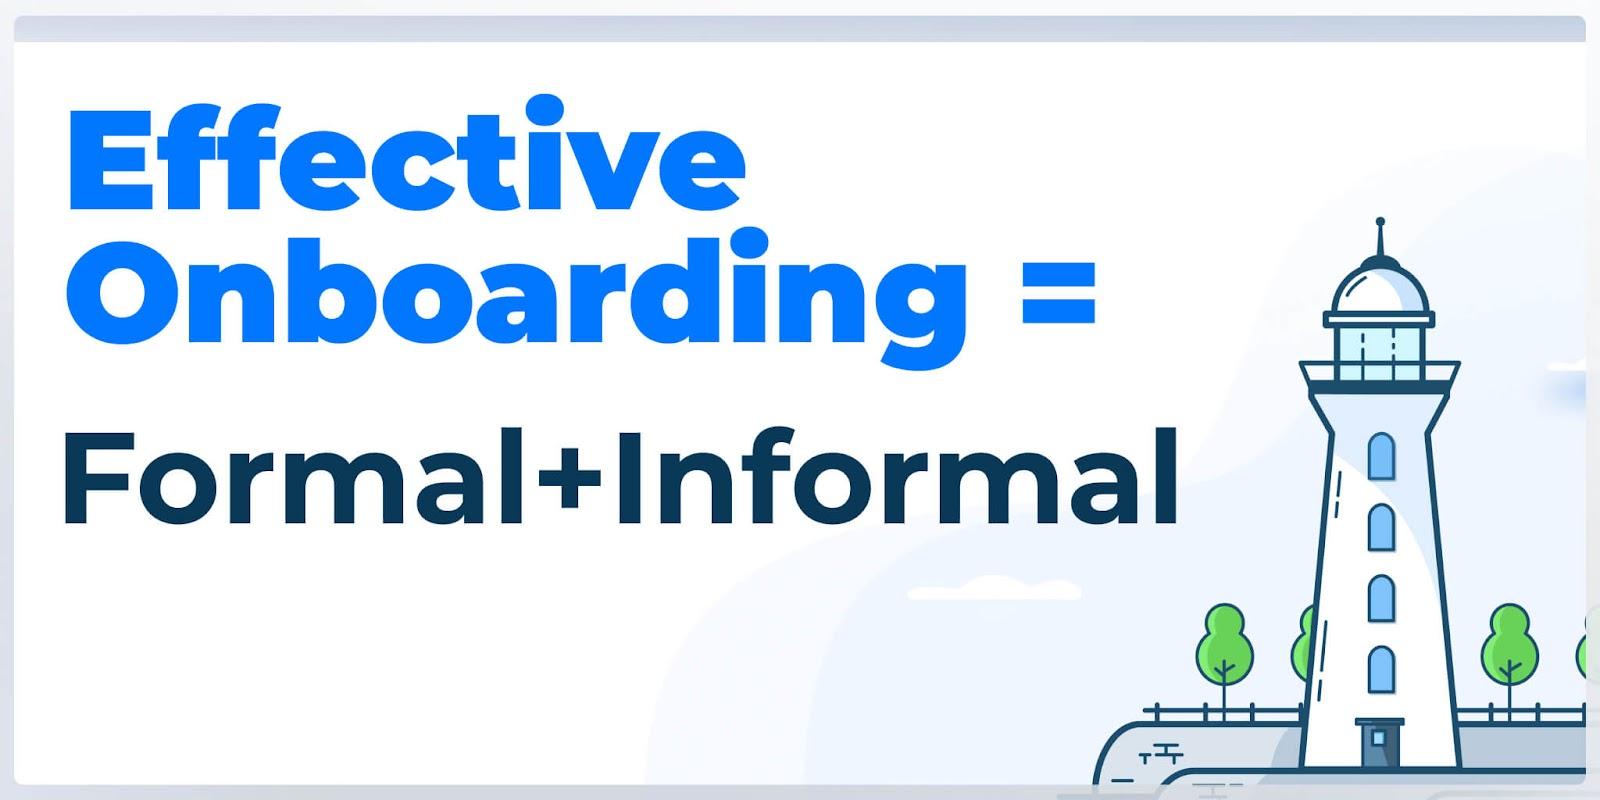 effective onboarding process